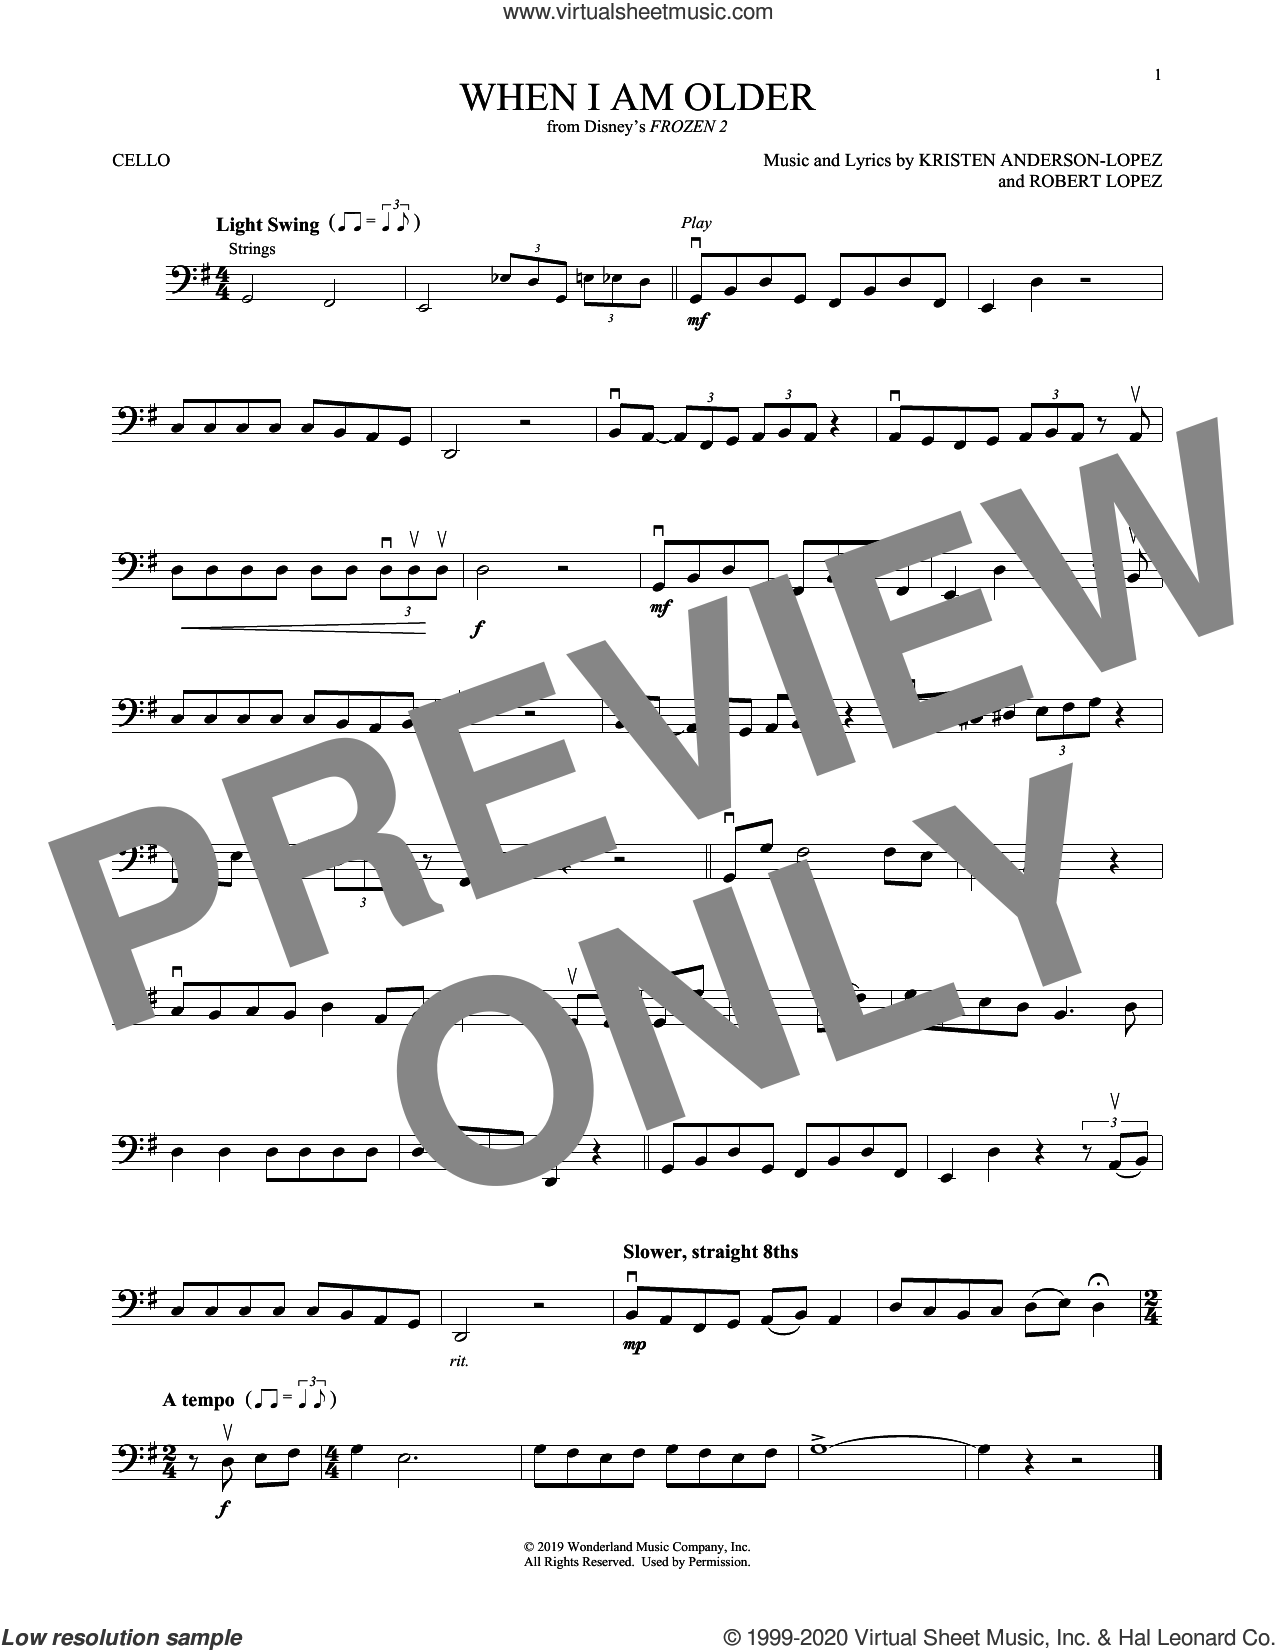 When I Am Older (from Disney's Frozen 2) sheet music for cello solo by Josh Gad, Kristen Anderson-Lopez and Robert Lopez, intermediate skill level